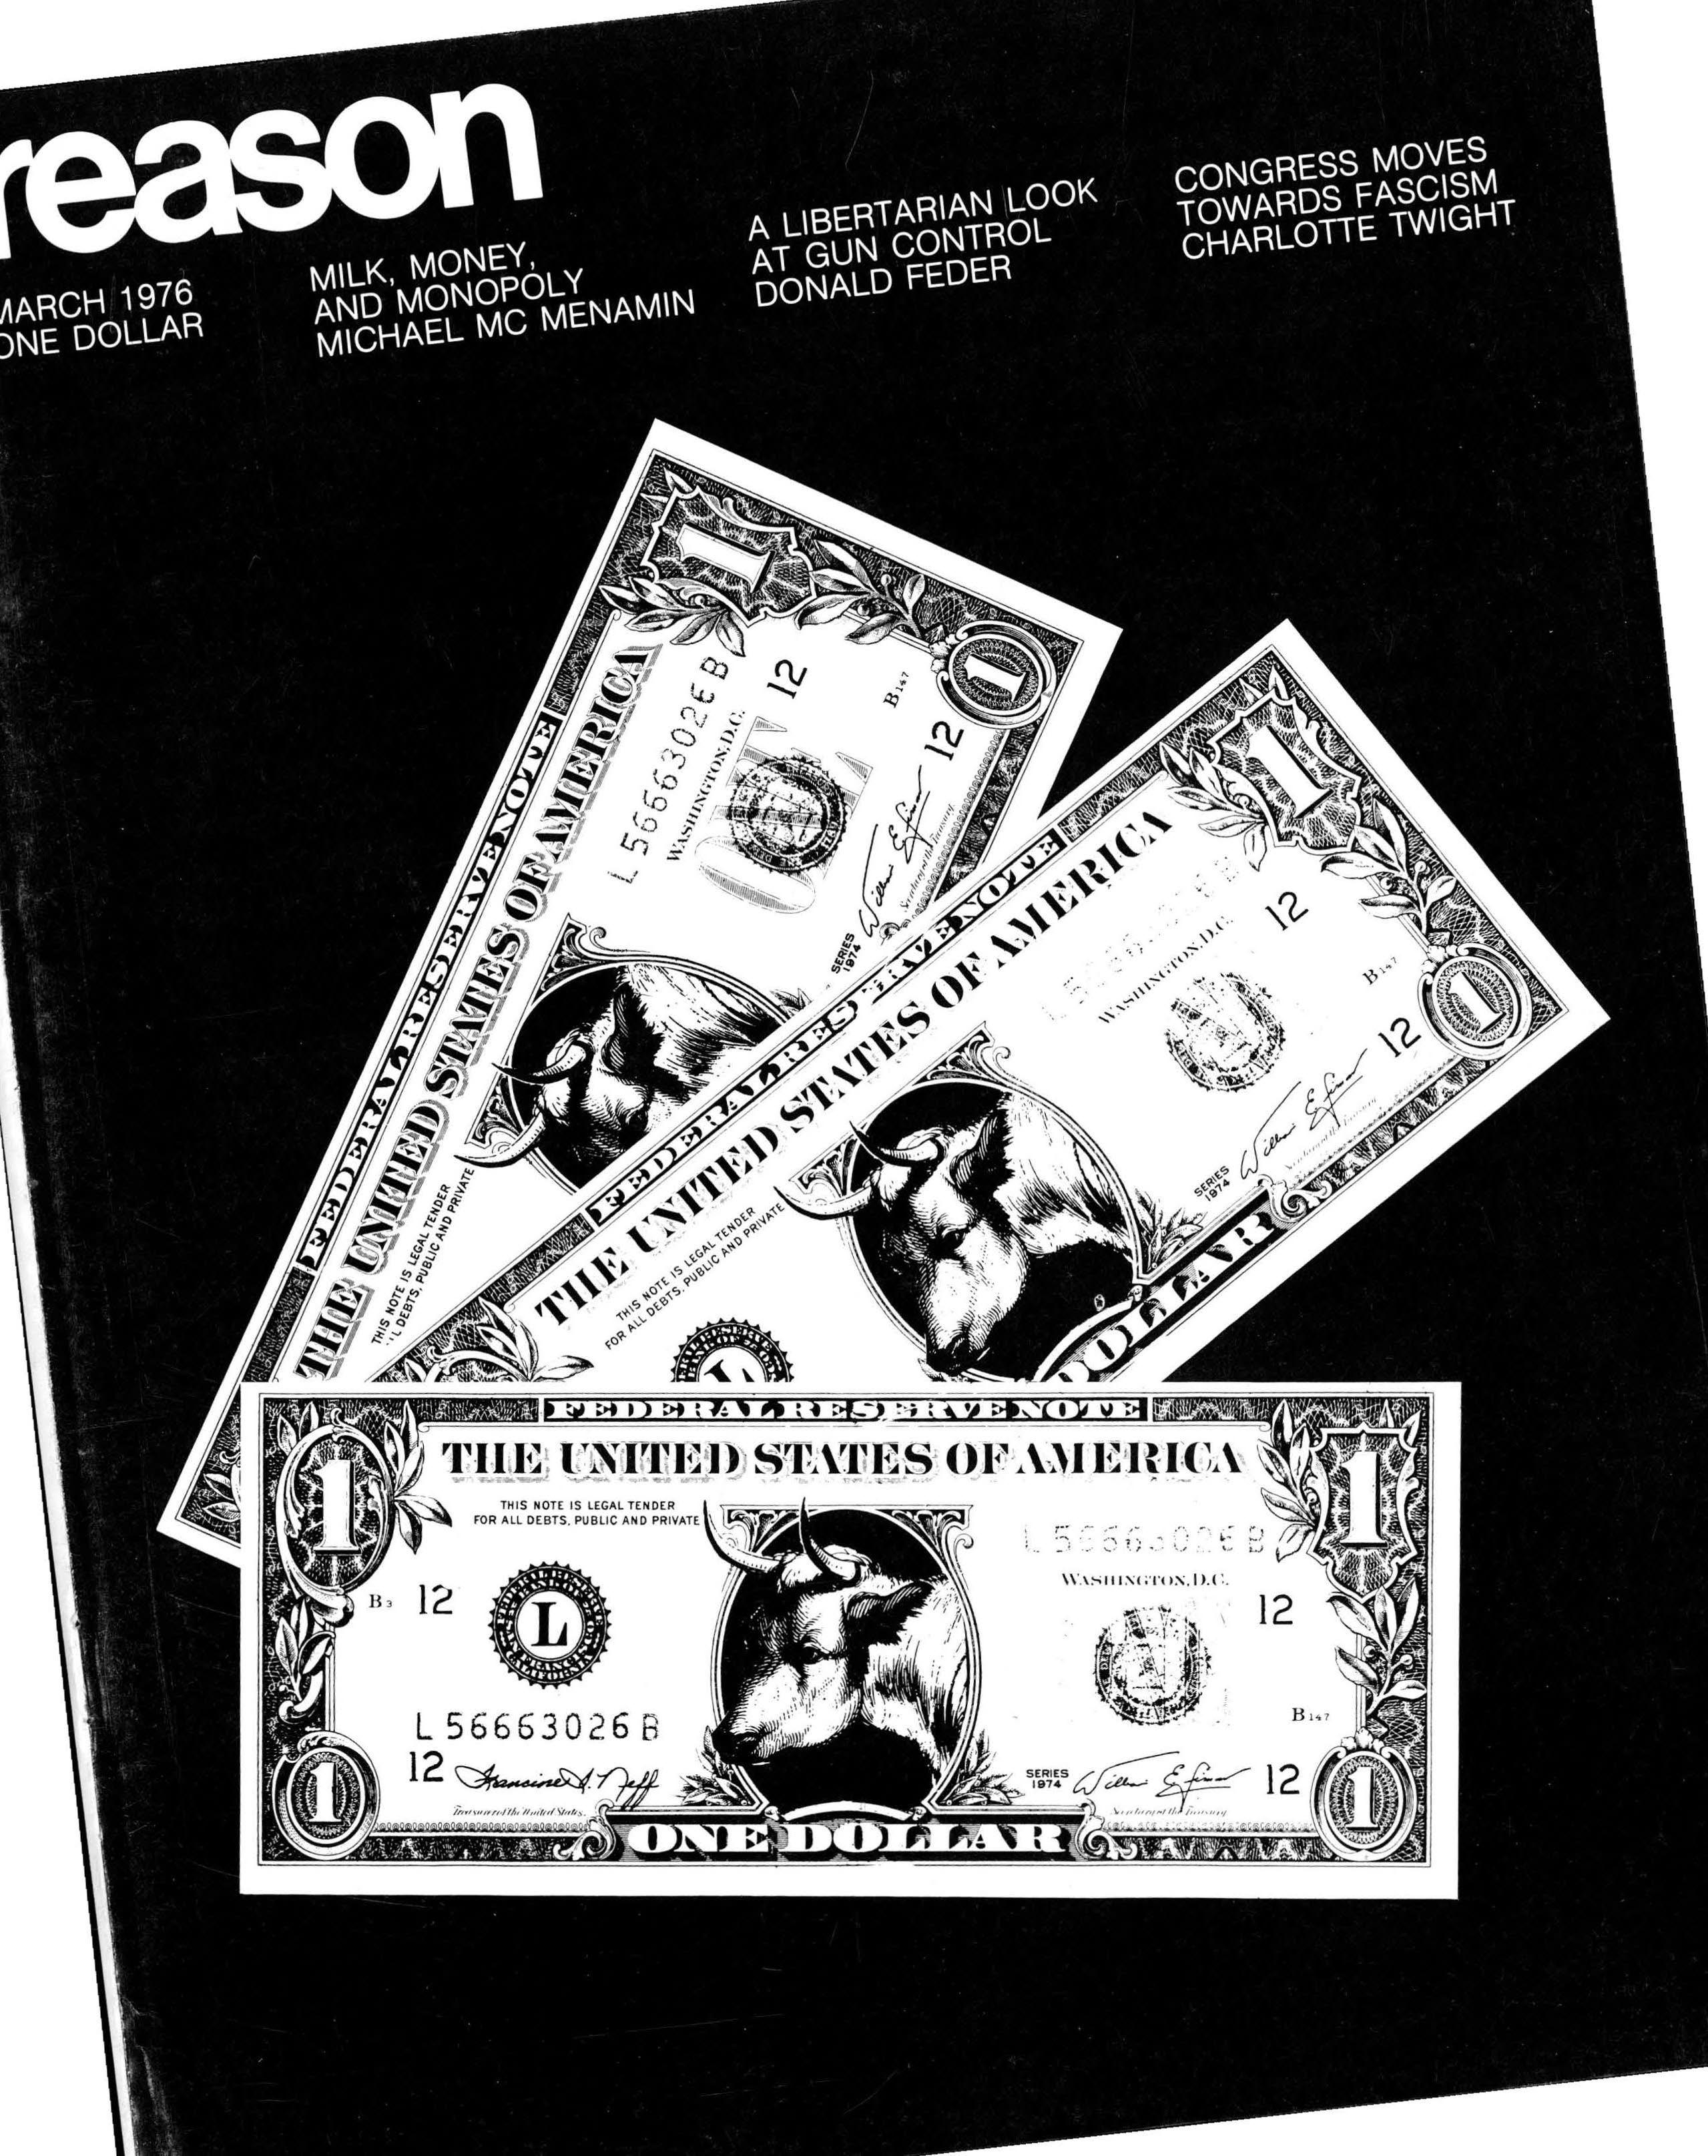 Reason Magazine, March 1976 cover image